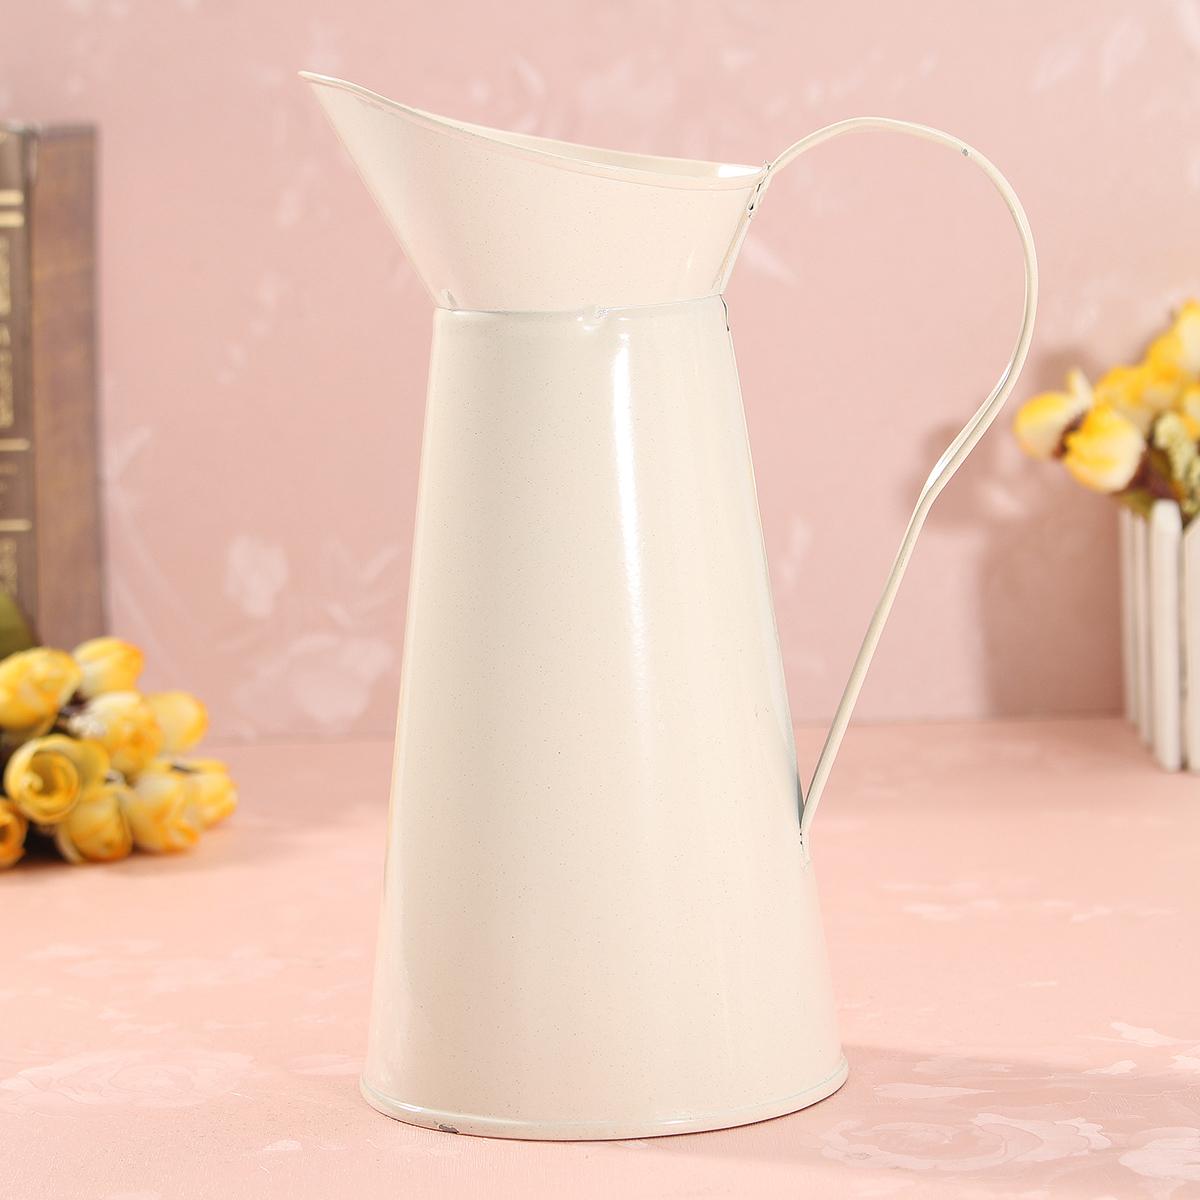 White Vintage Shabby Chic Cream Vase Enamel Pitcher Jug Pot Tall Metal Wedding Decor